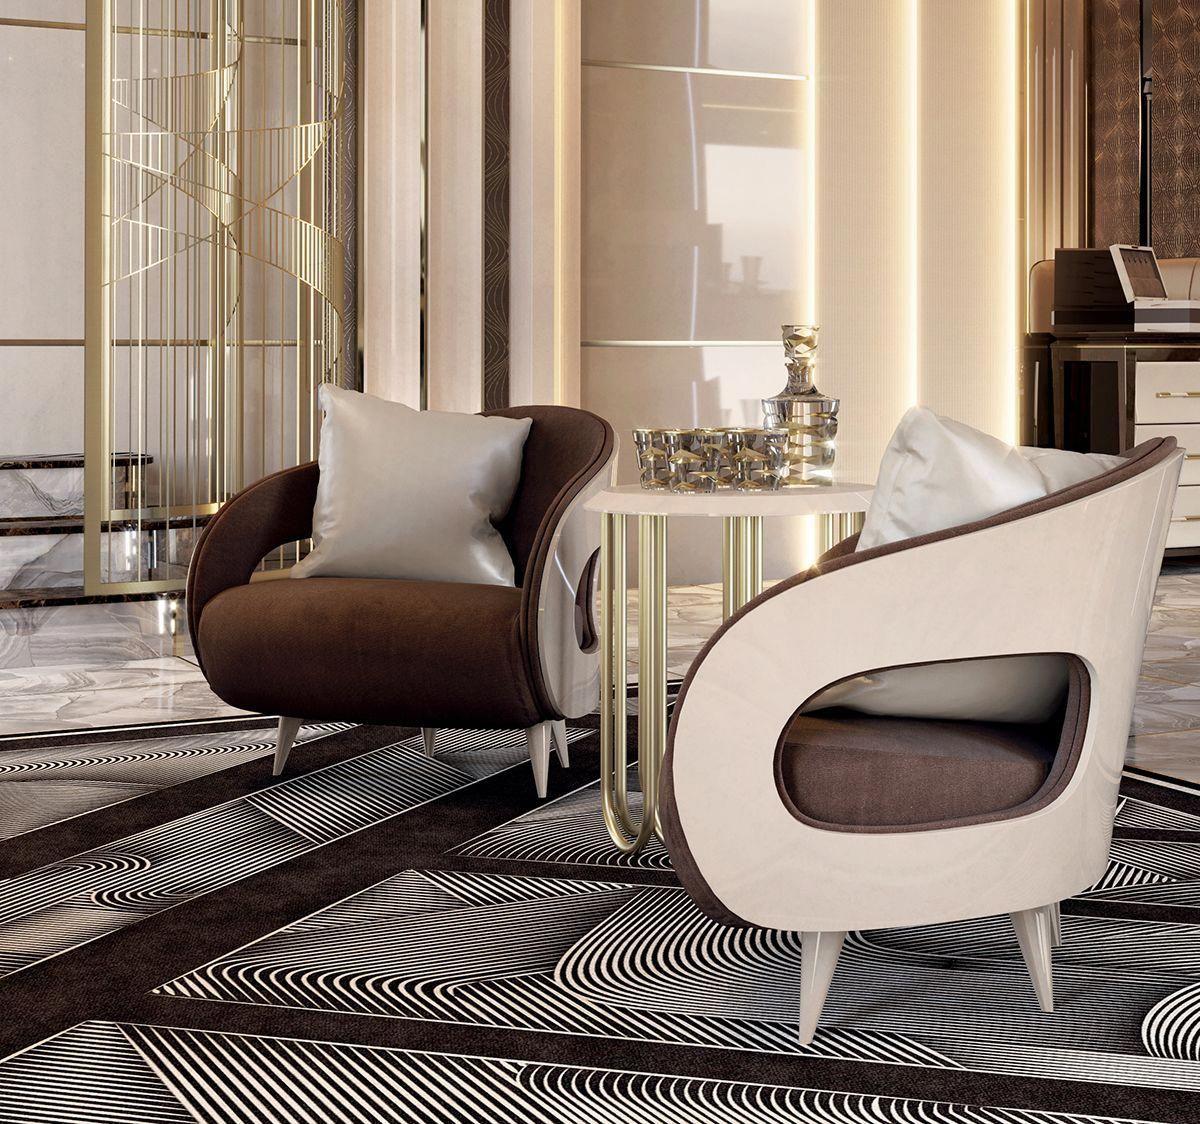 Furniture For Sale Online Furniture60s Code 5265420570 Luxury Furniture Luxury Furniture Design Furniture